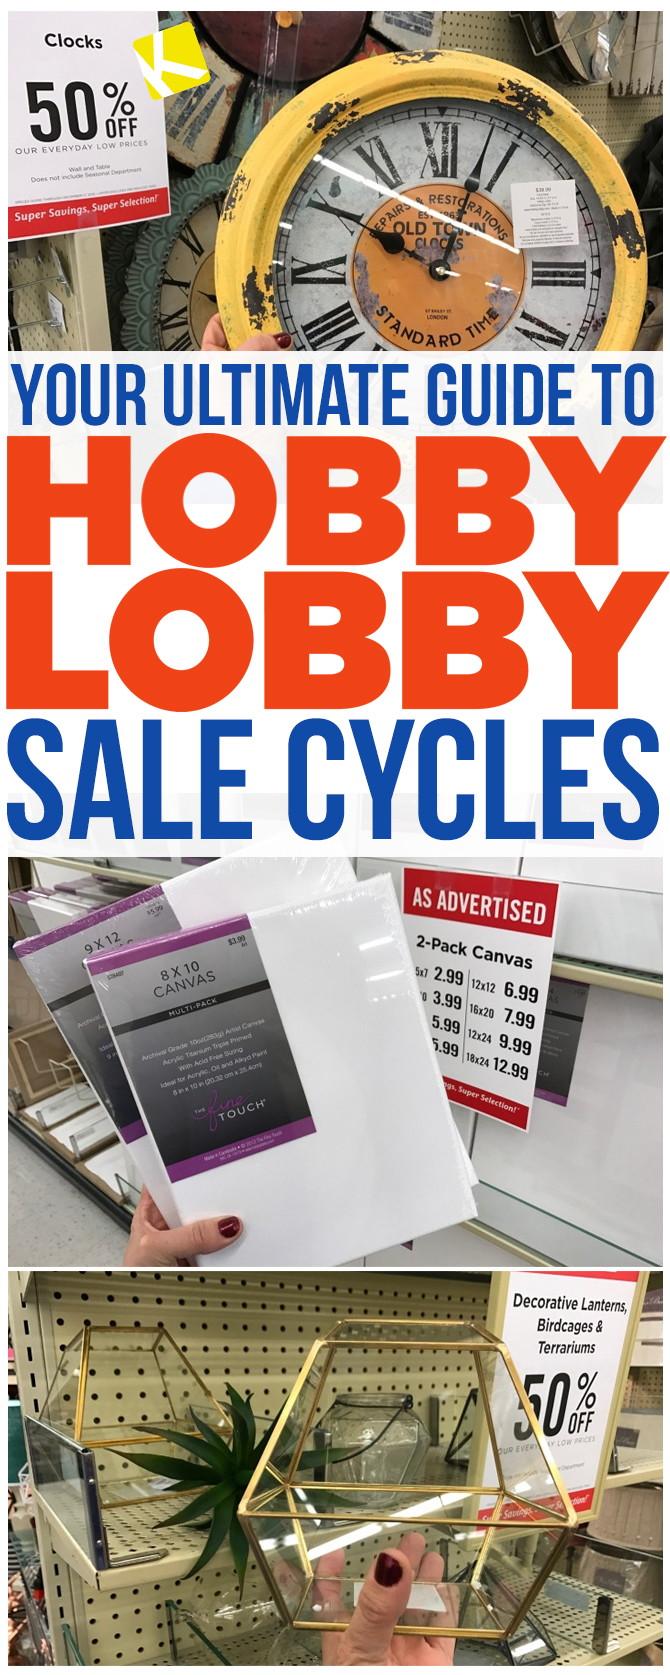 White apron hobby lobby - 34 1k